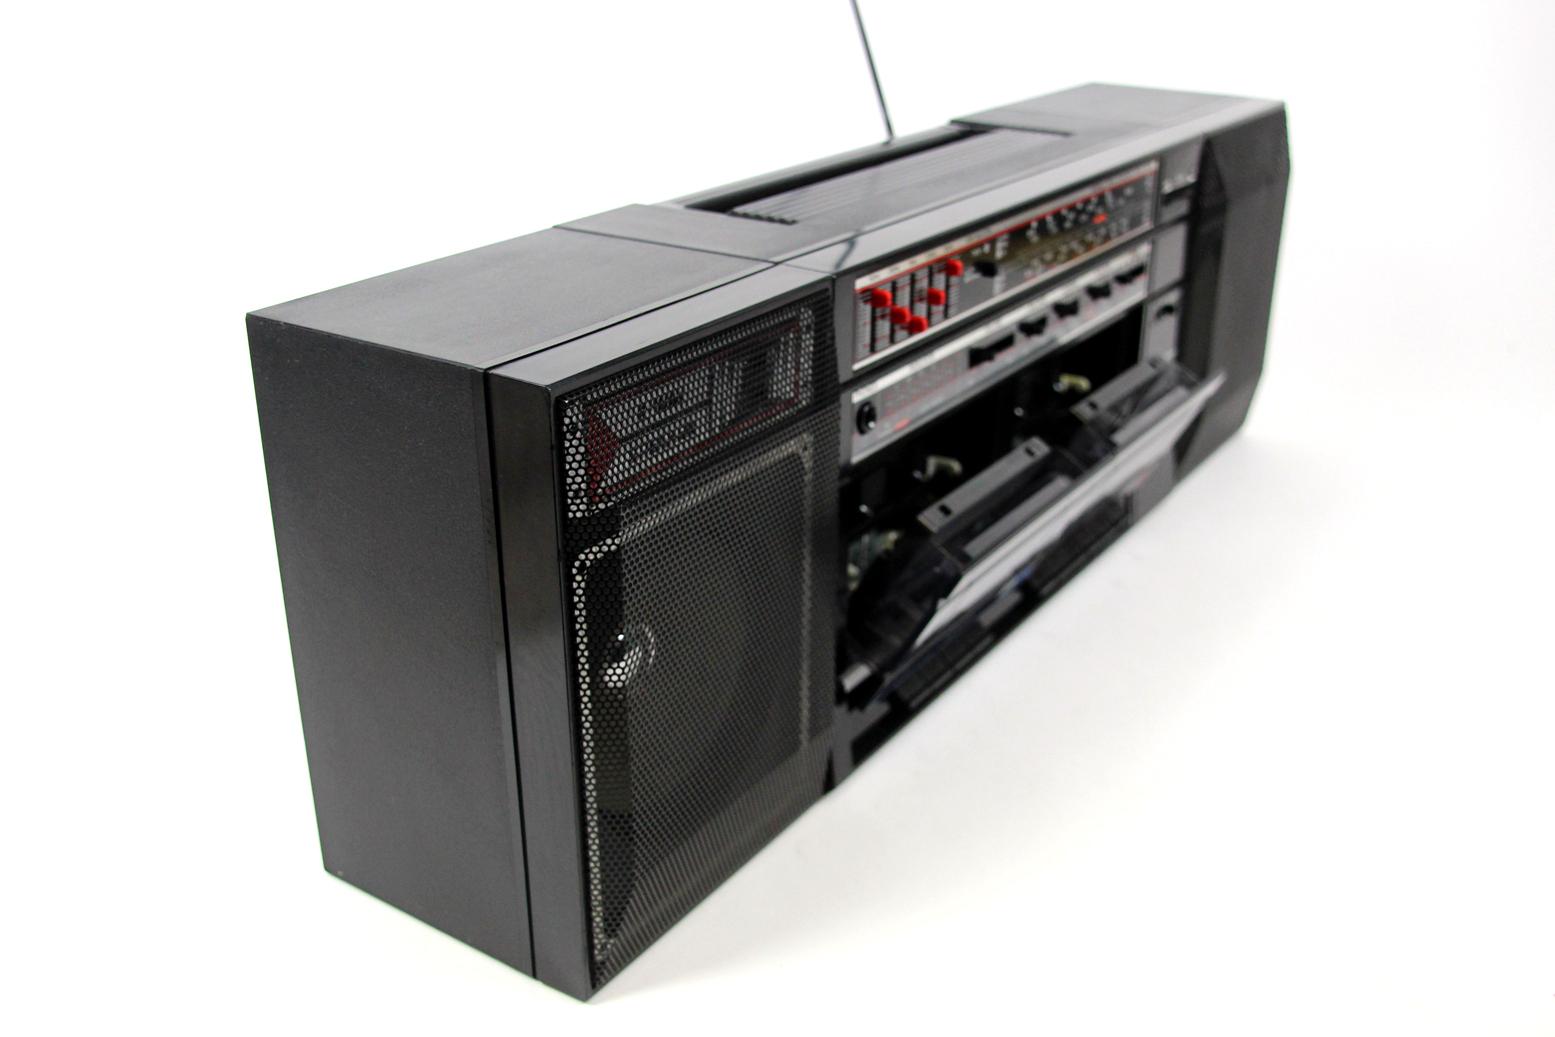 sharp wf 372 stereo kassettenrecorder abnehmbare boxen. Black Bedroom Furniture Sets. Home Design Ideas